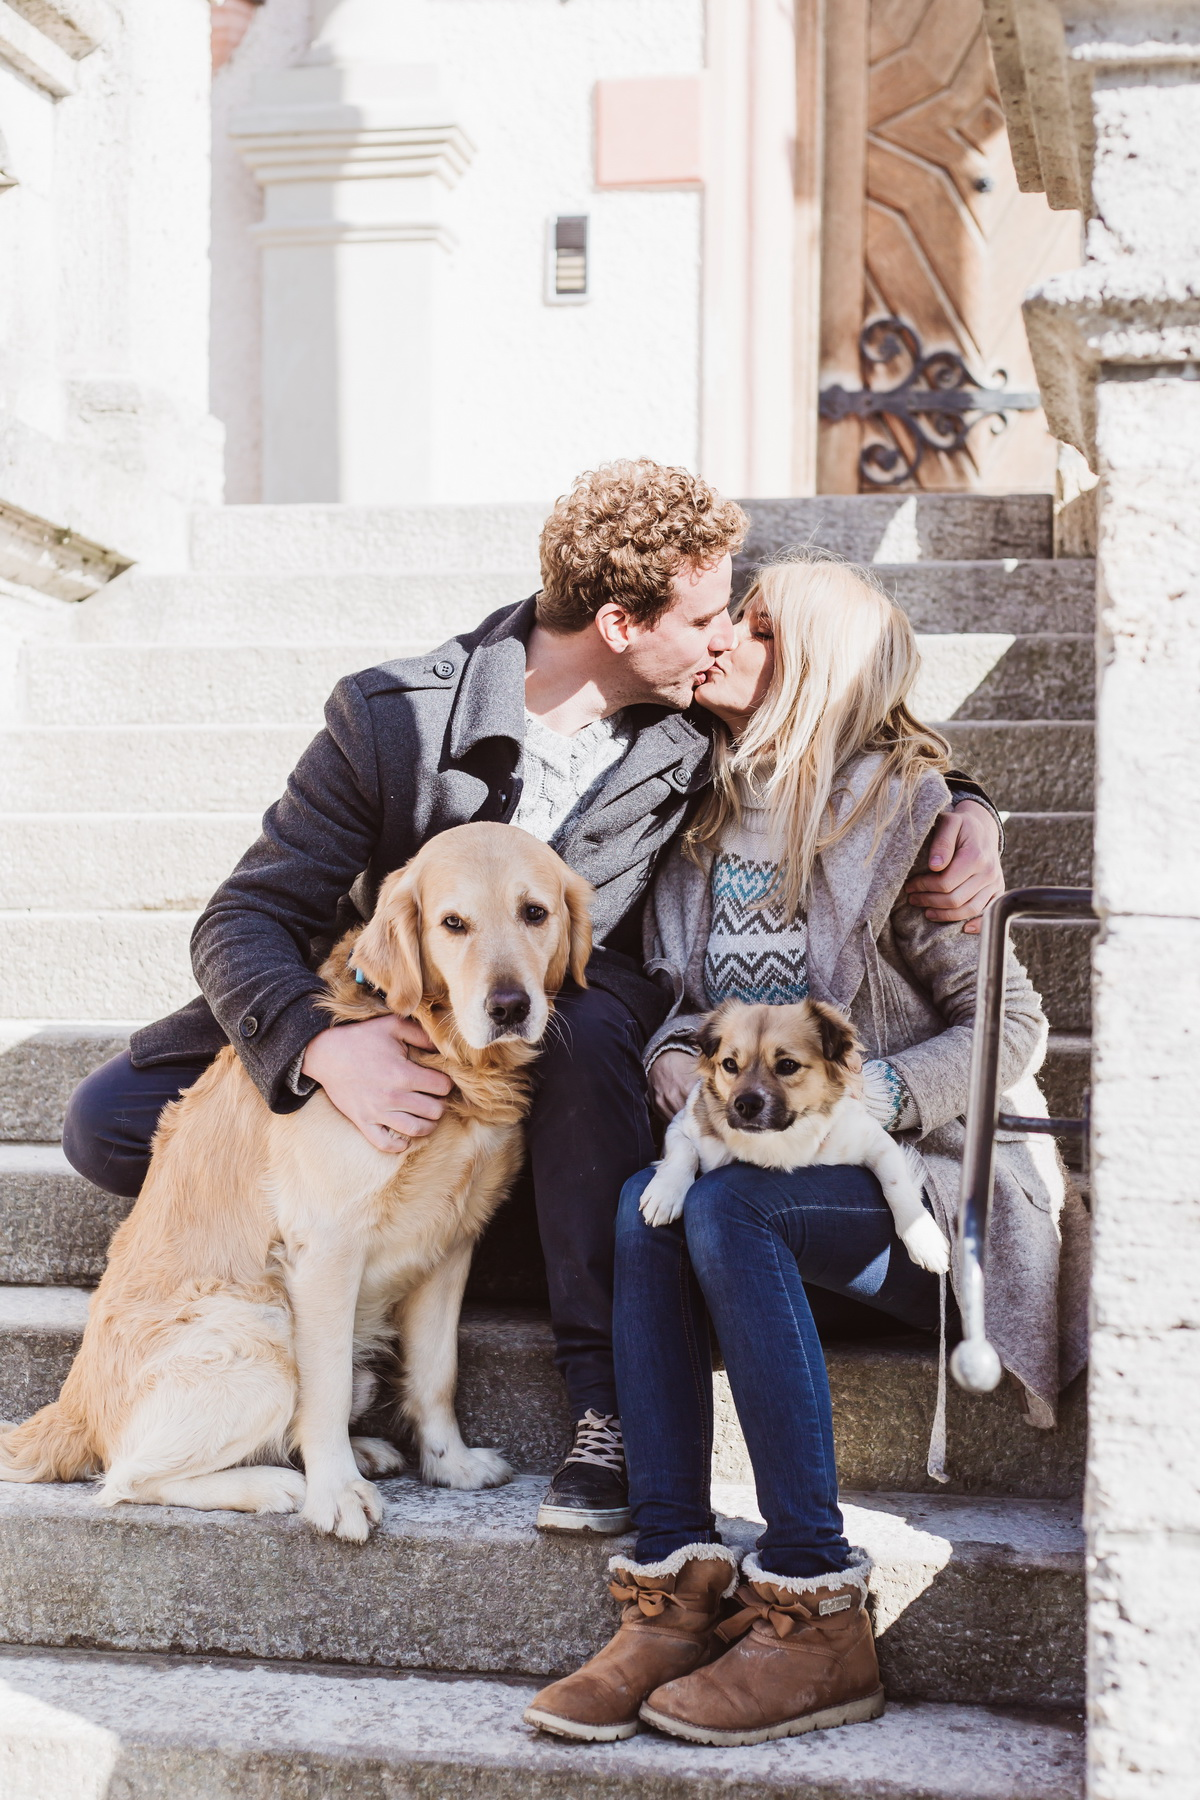 Loveshoot - Julia und Stefan - Claudia Sittig Photography - Lake Ammersee IMG_2487